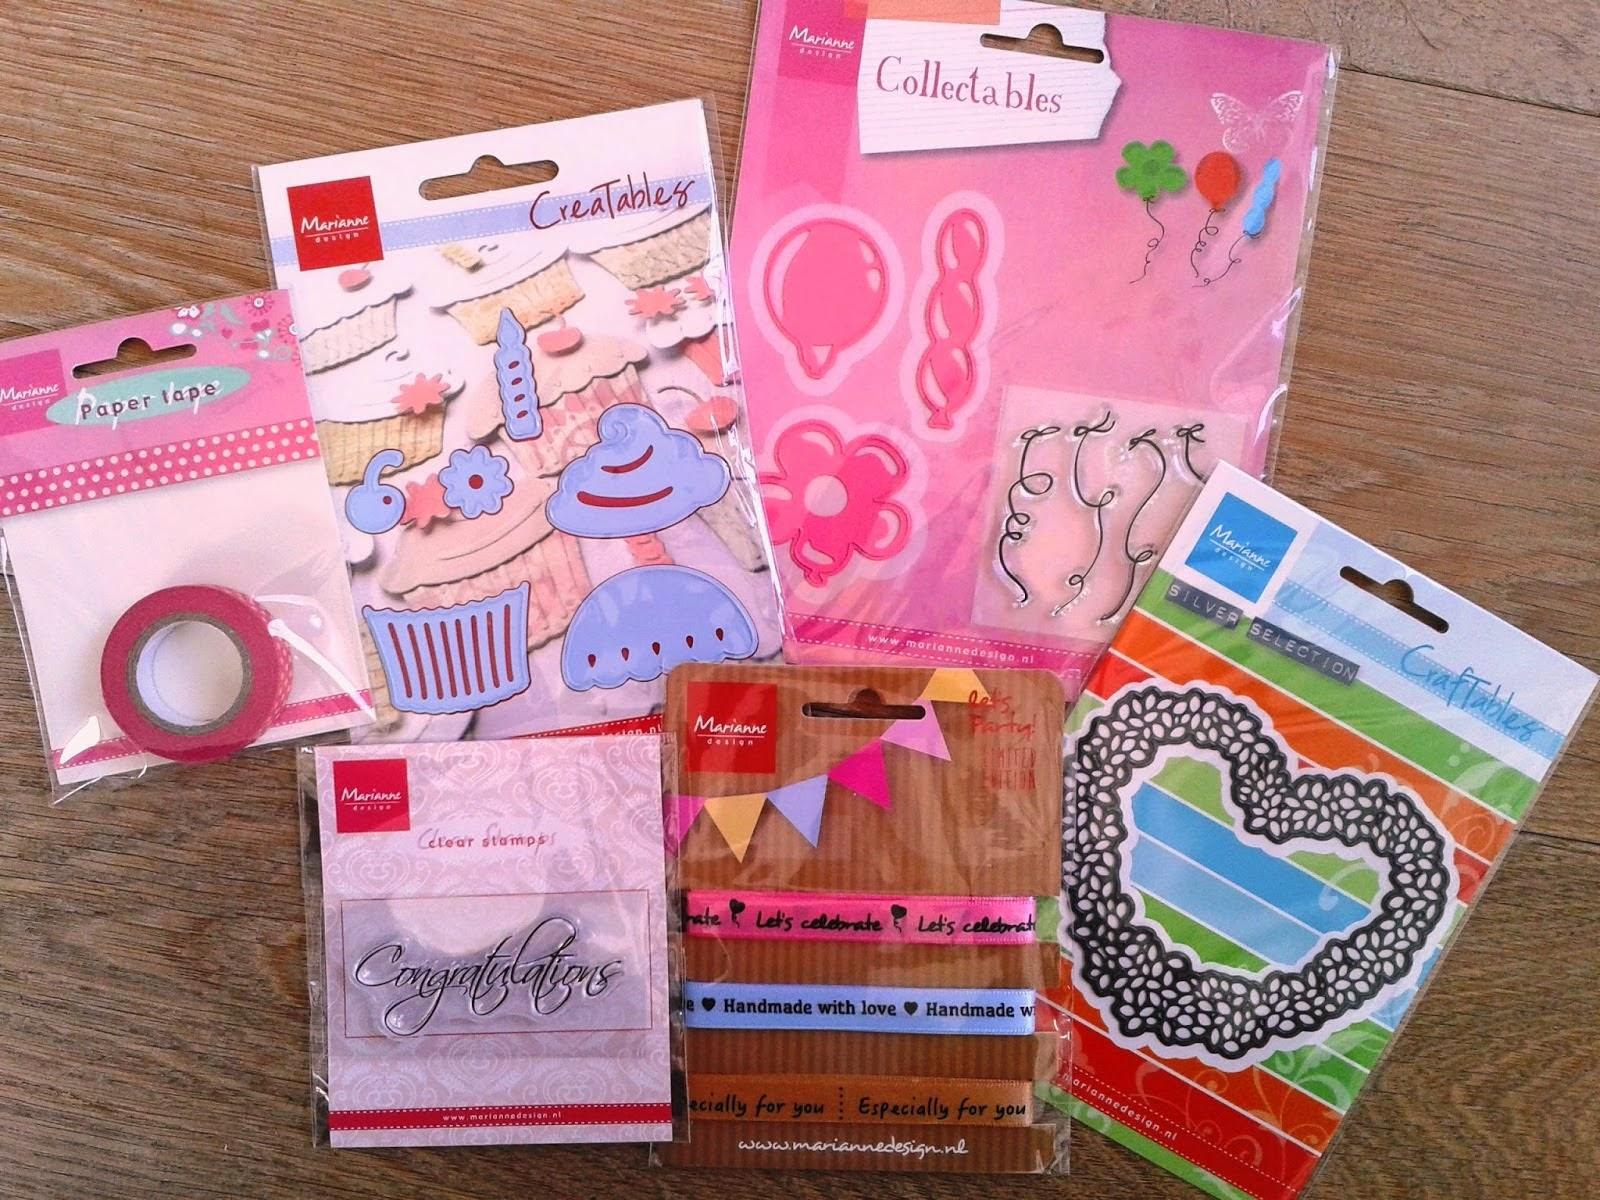 Candy gewonnen bij Marianne Design